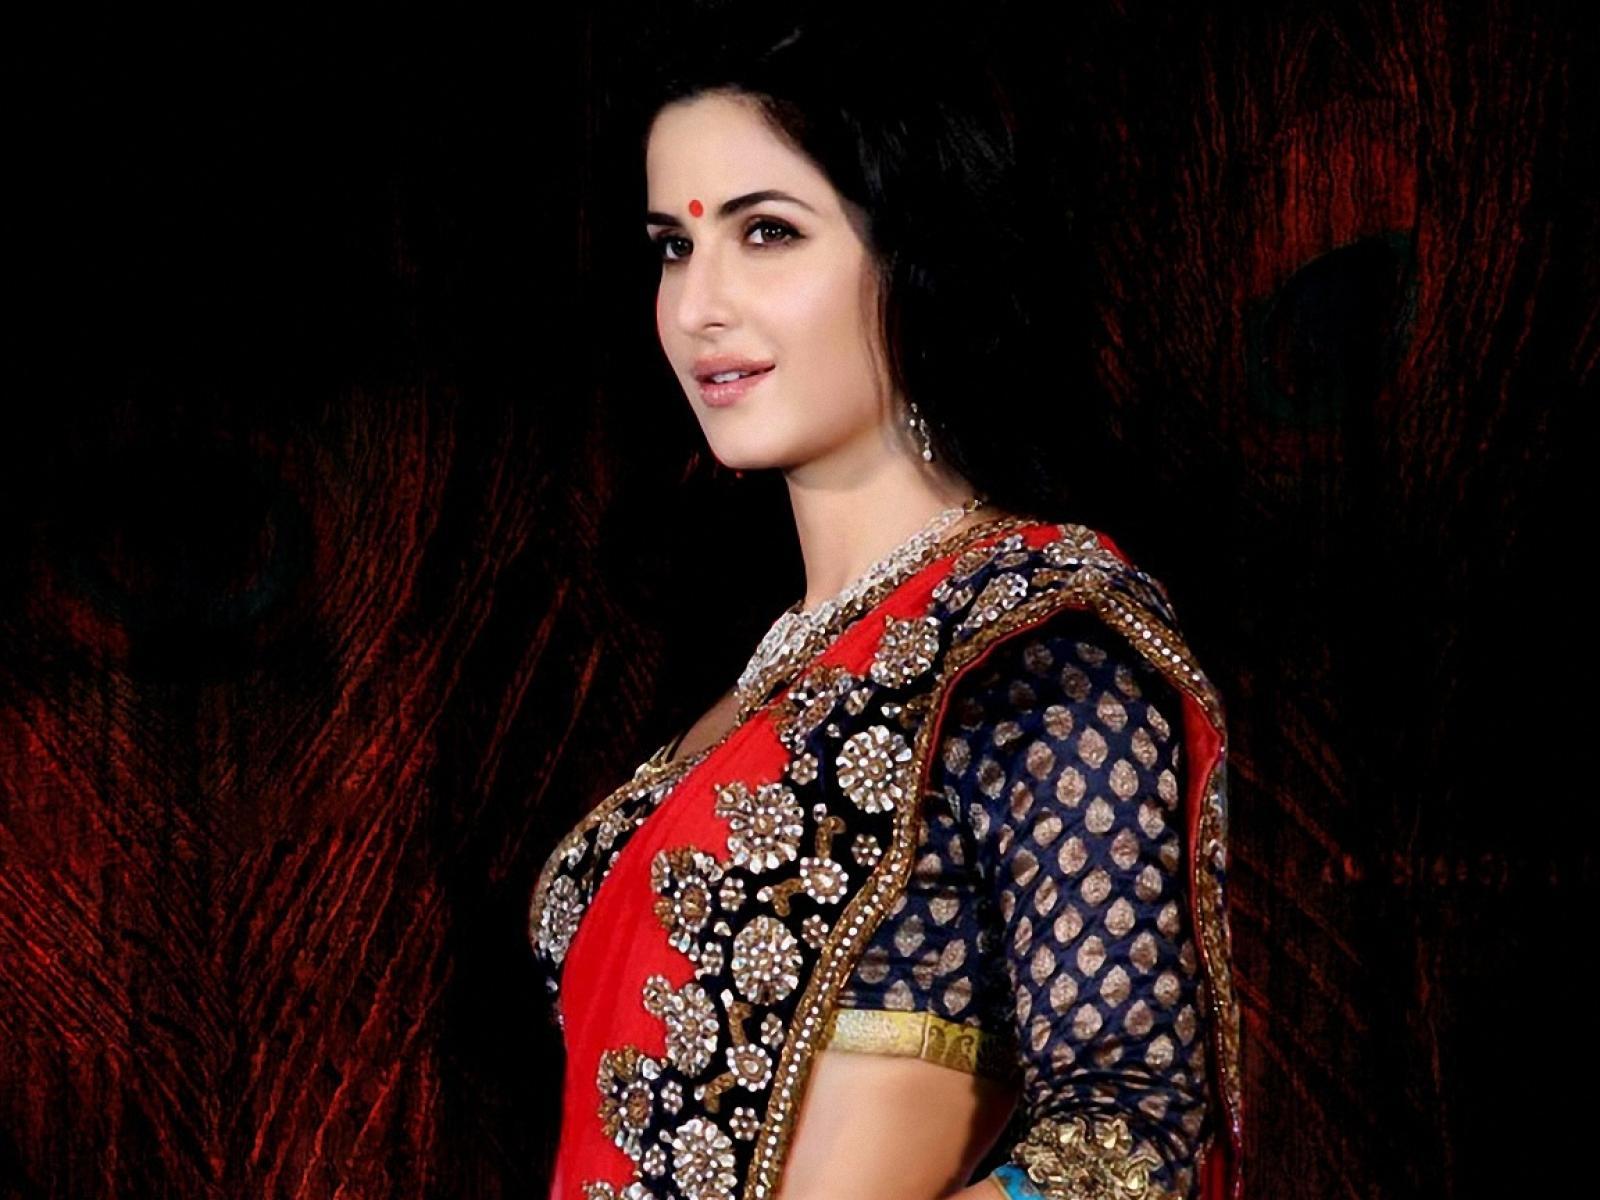 Bollywood Actress In Saree Hd Wallpapers - Katrina Kaif Hd 4k , HD Wallpaper & Backgrounds